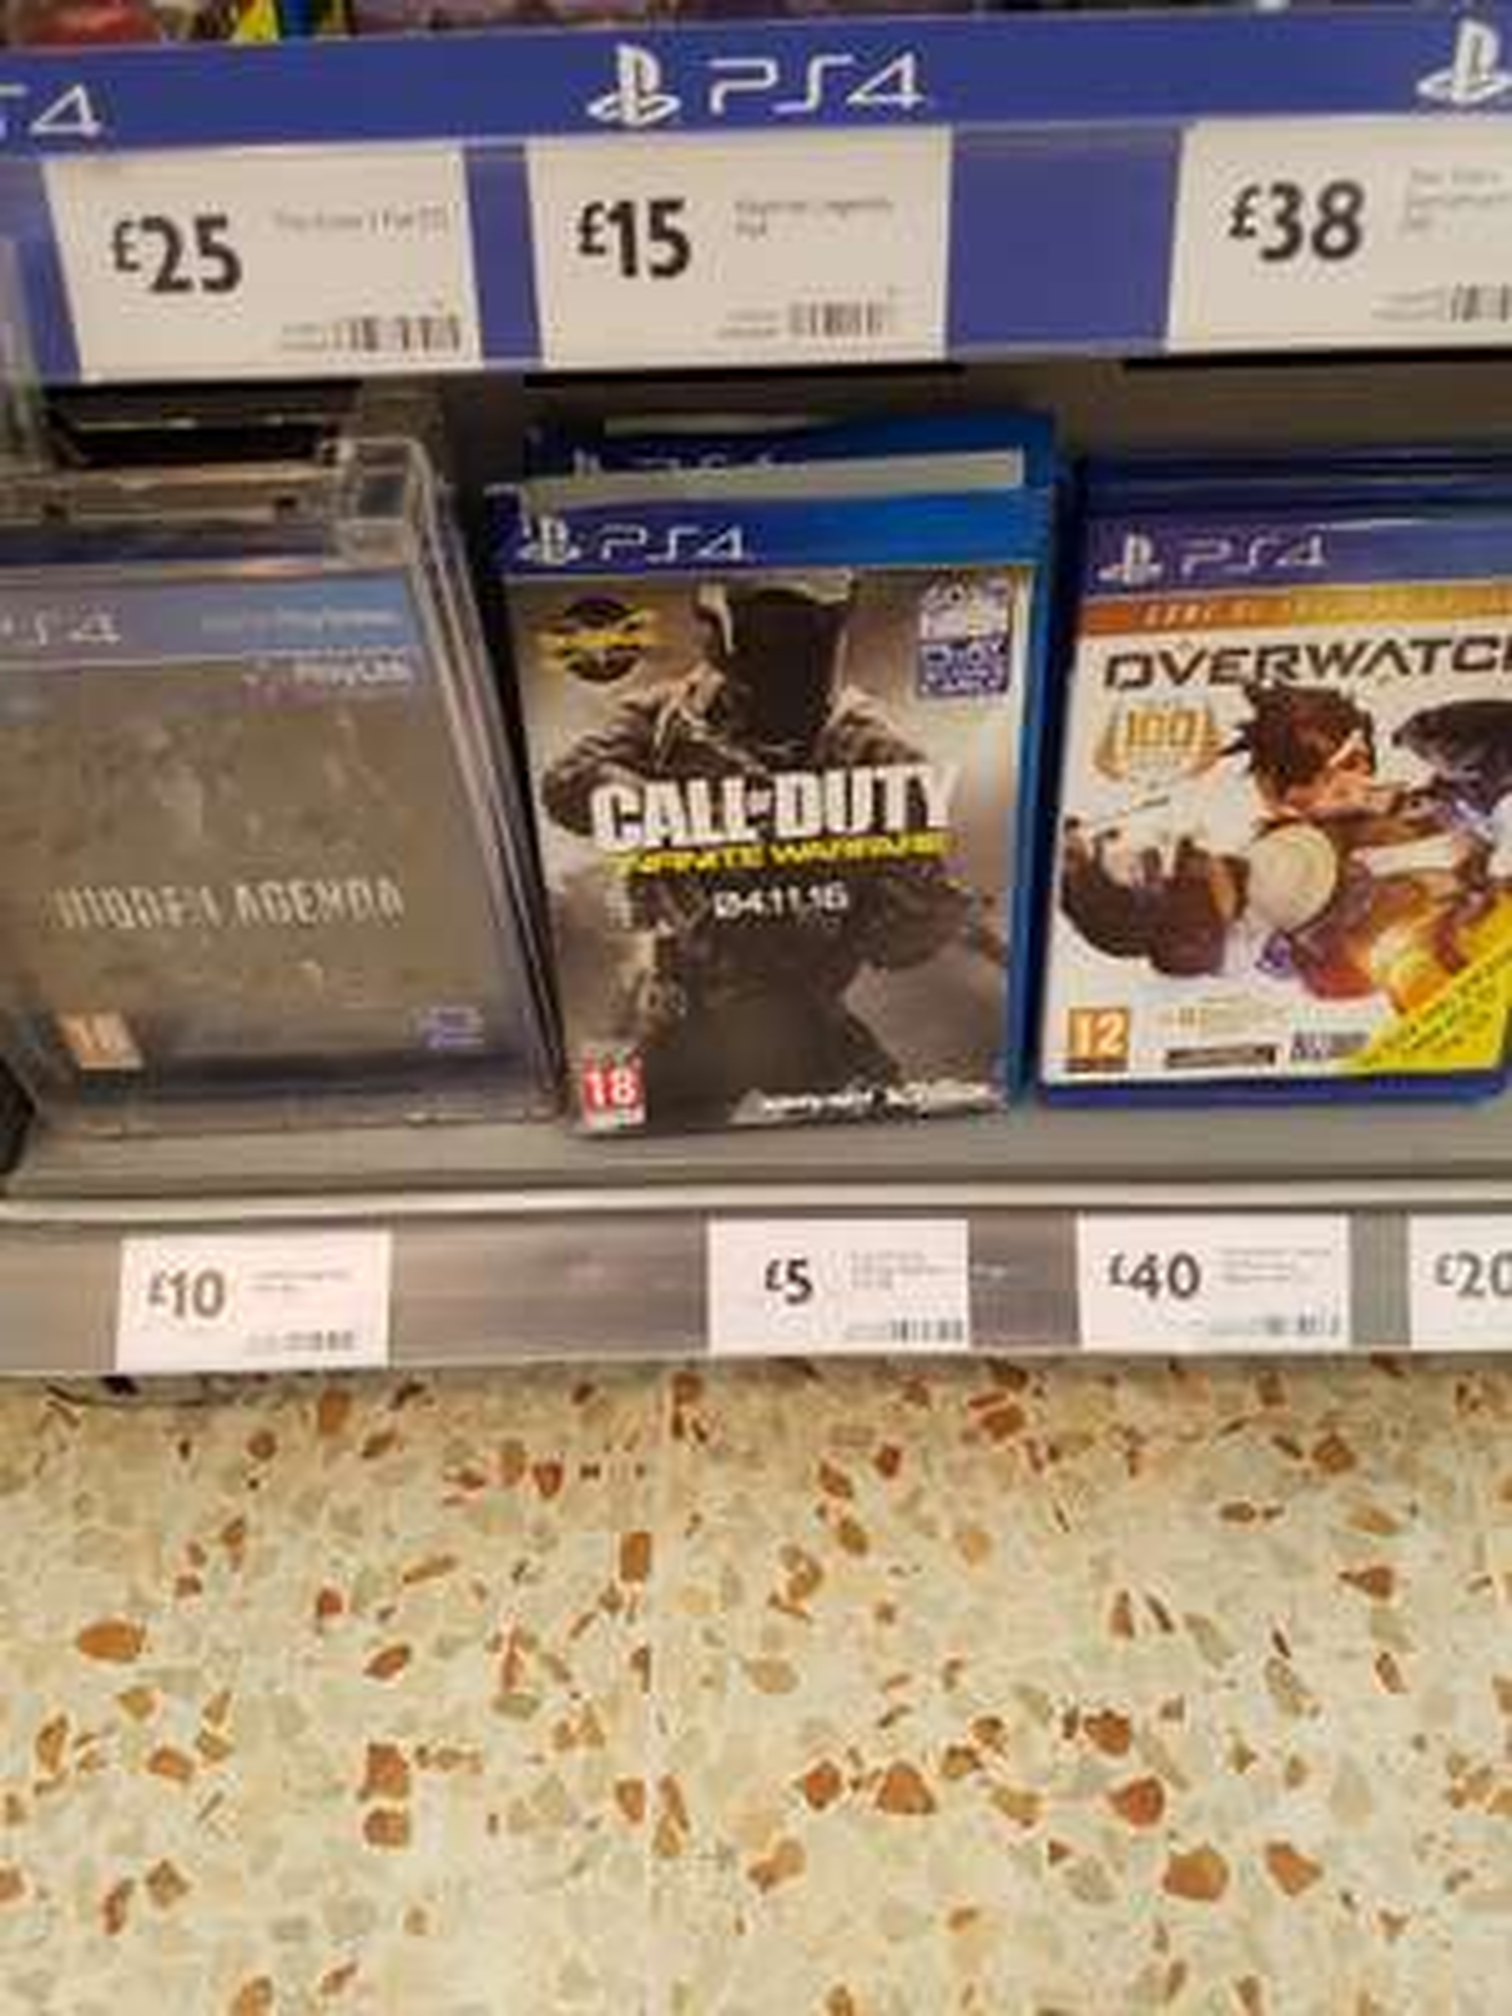 Call of Duty Infinite Warfare - £5 in store Morrisons (Retford)